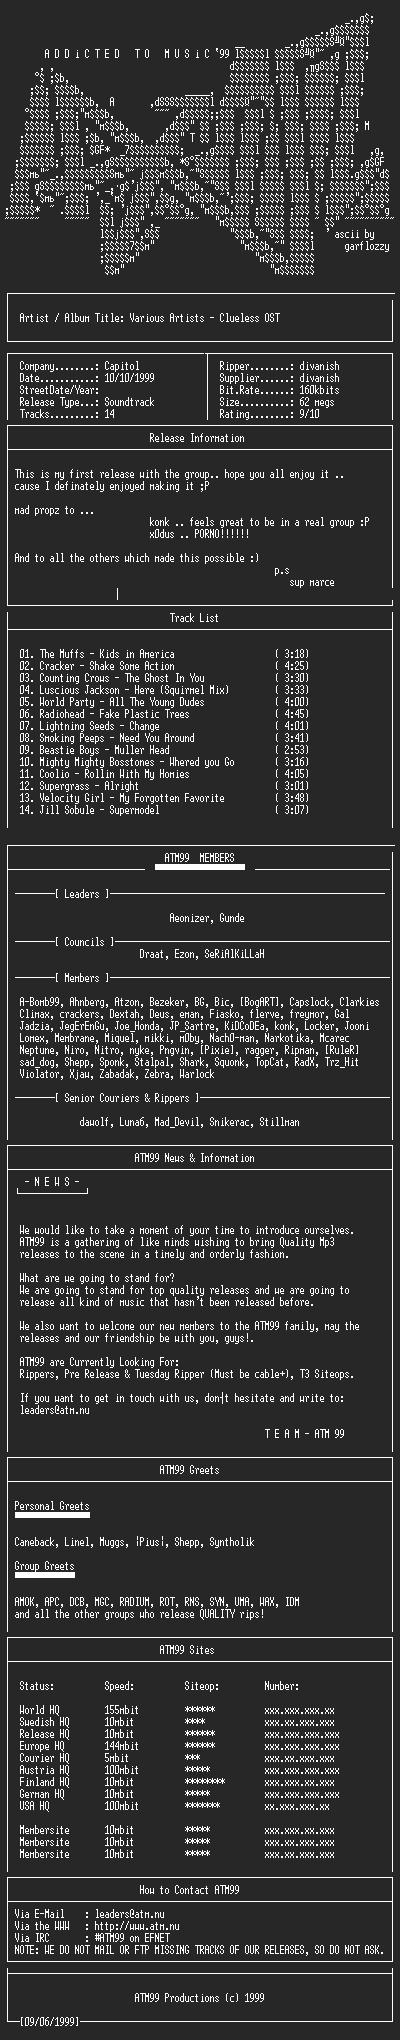 NFO file for VA_-_Clueless_OST_-_(1995)-ATM99